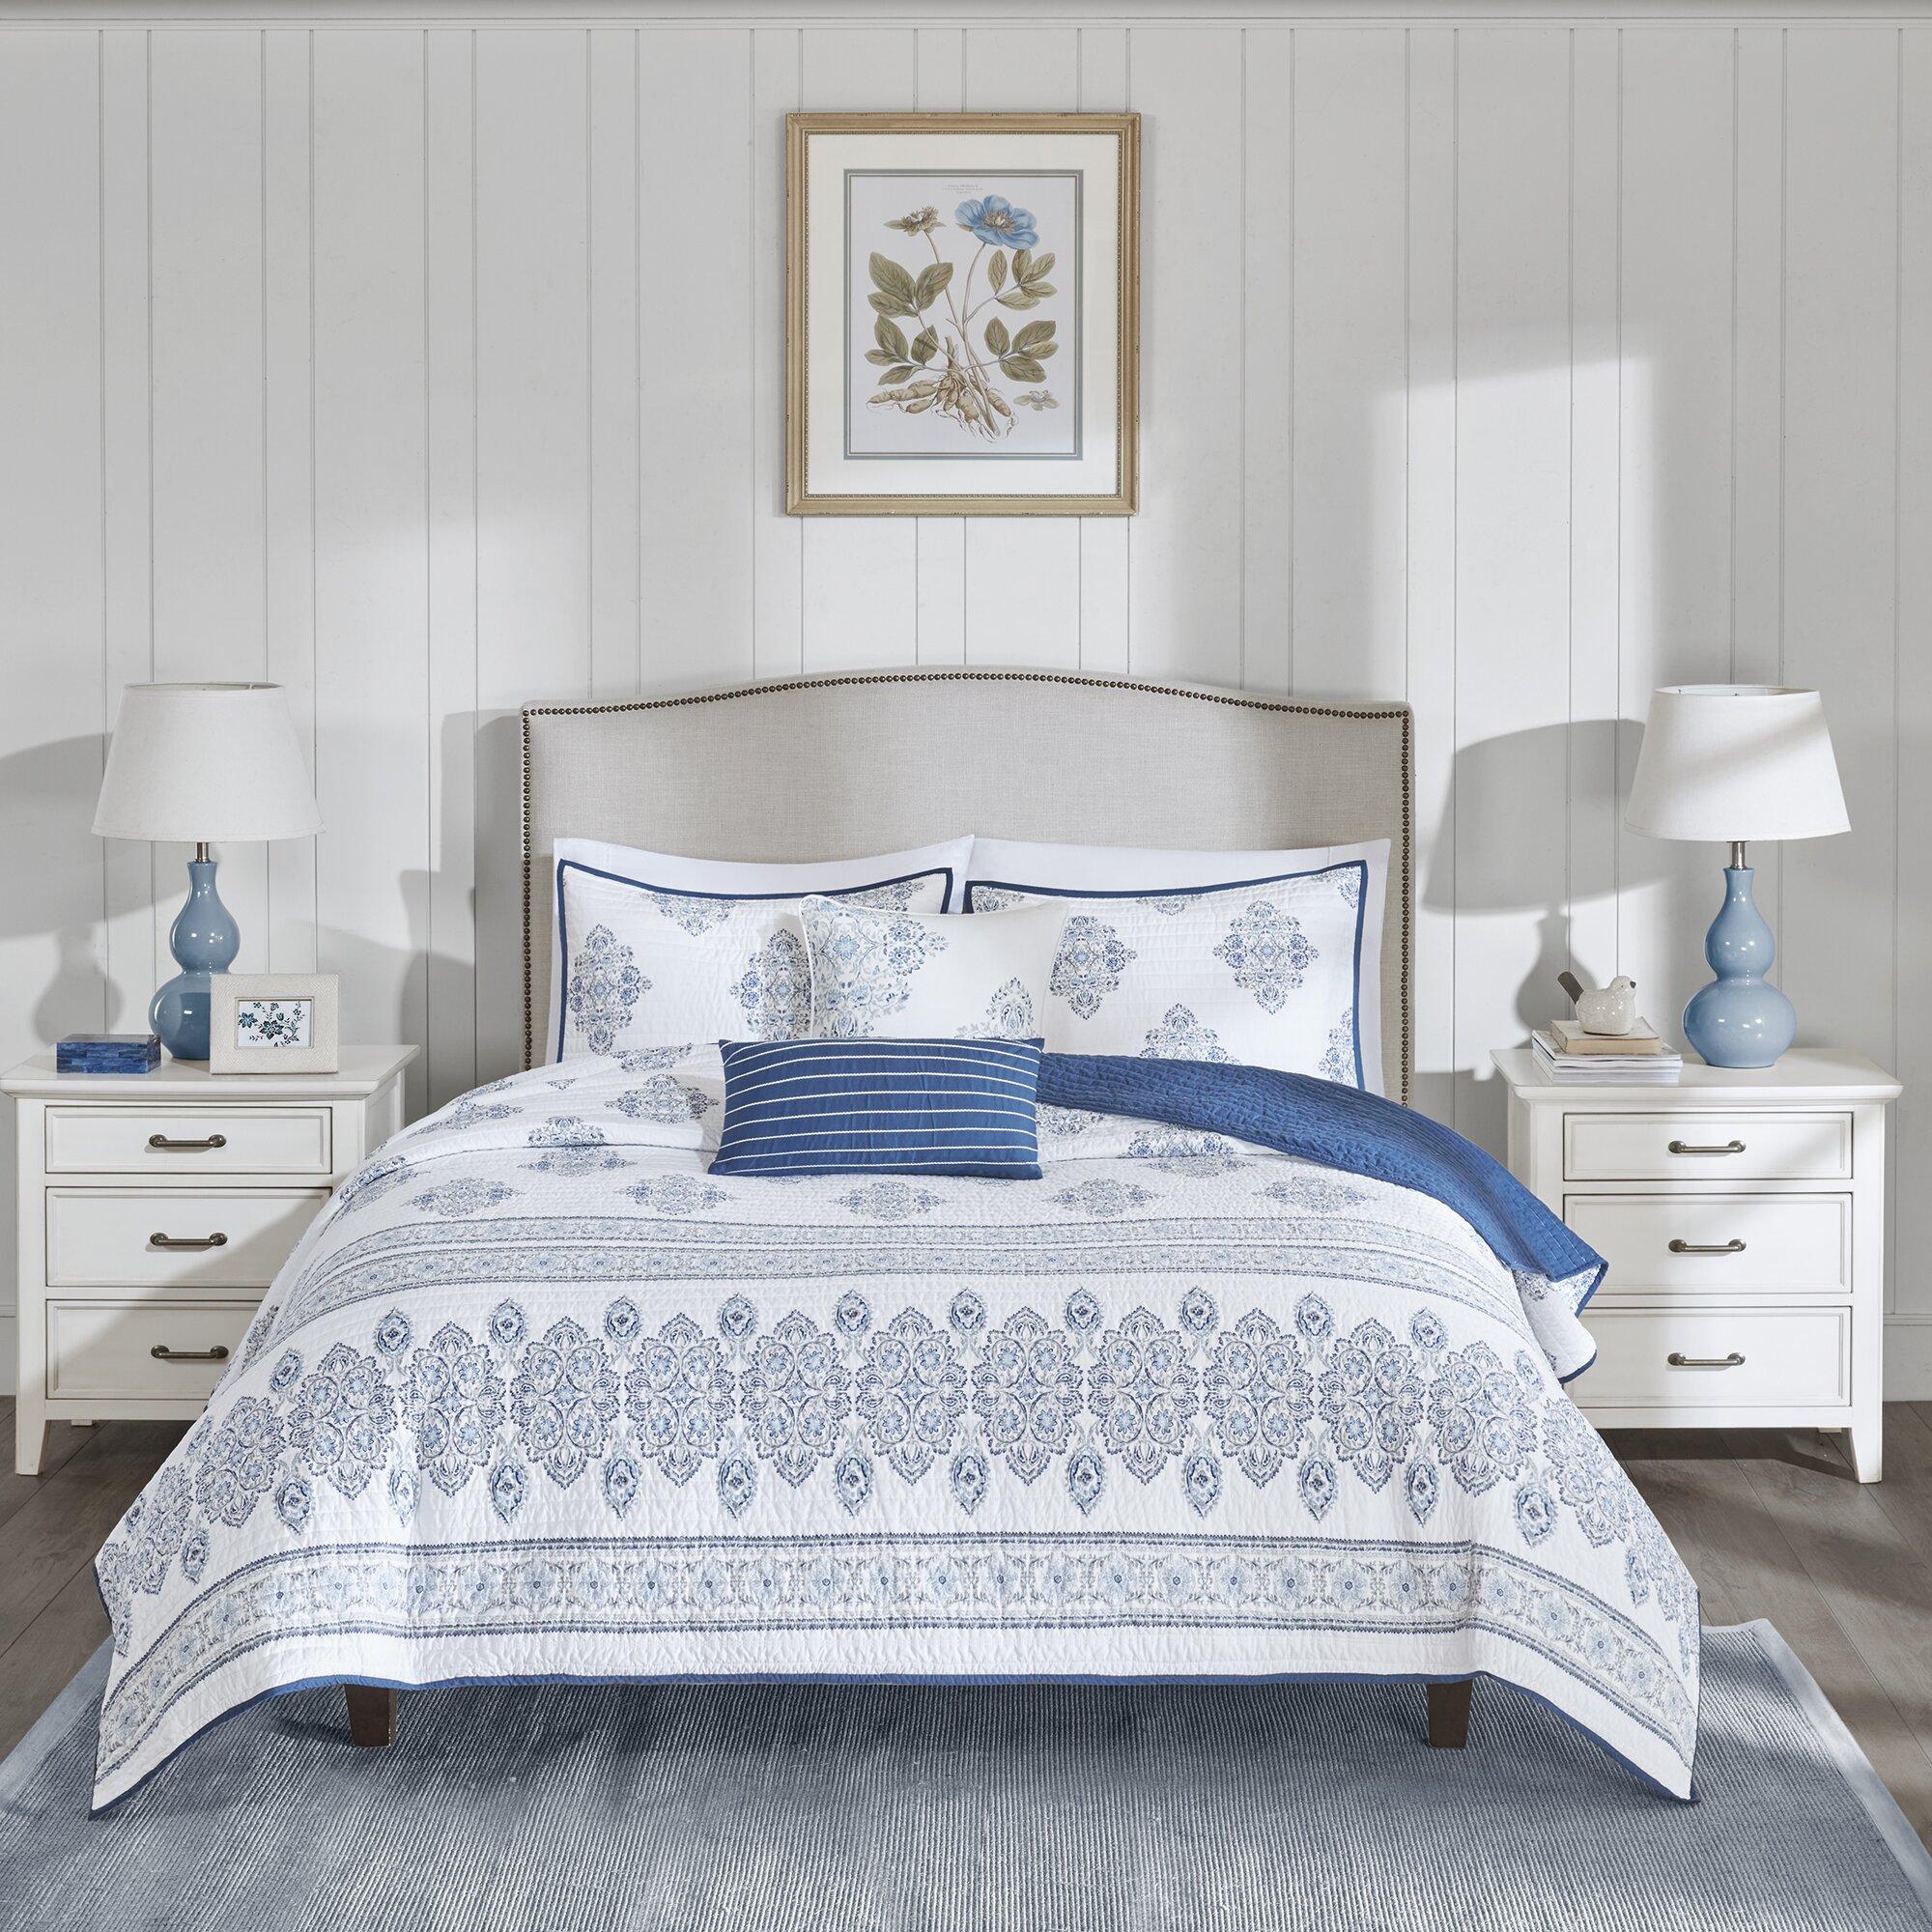 Sanibel Bedroom Furniture Harbor House Sanibel 5 Piece Coverlet Set Reviews Wayfair